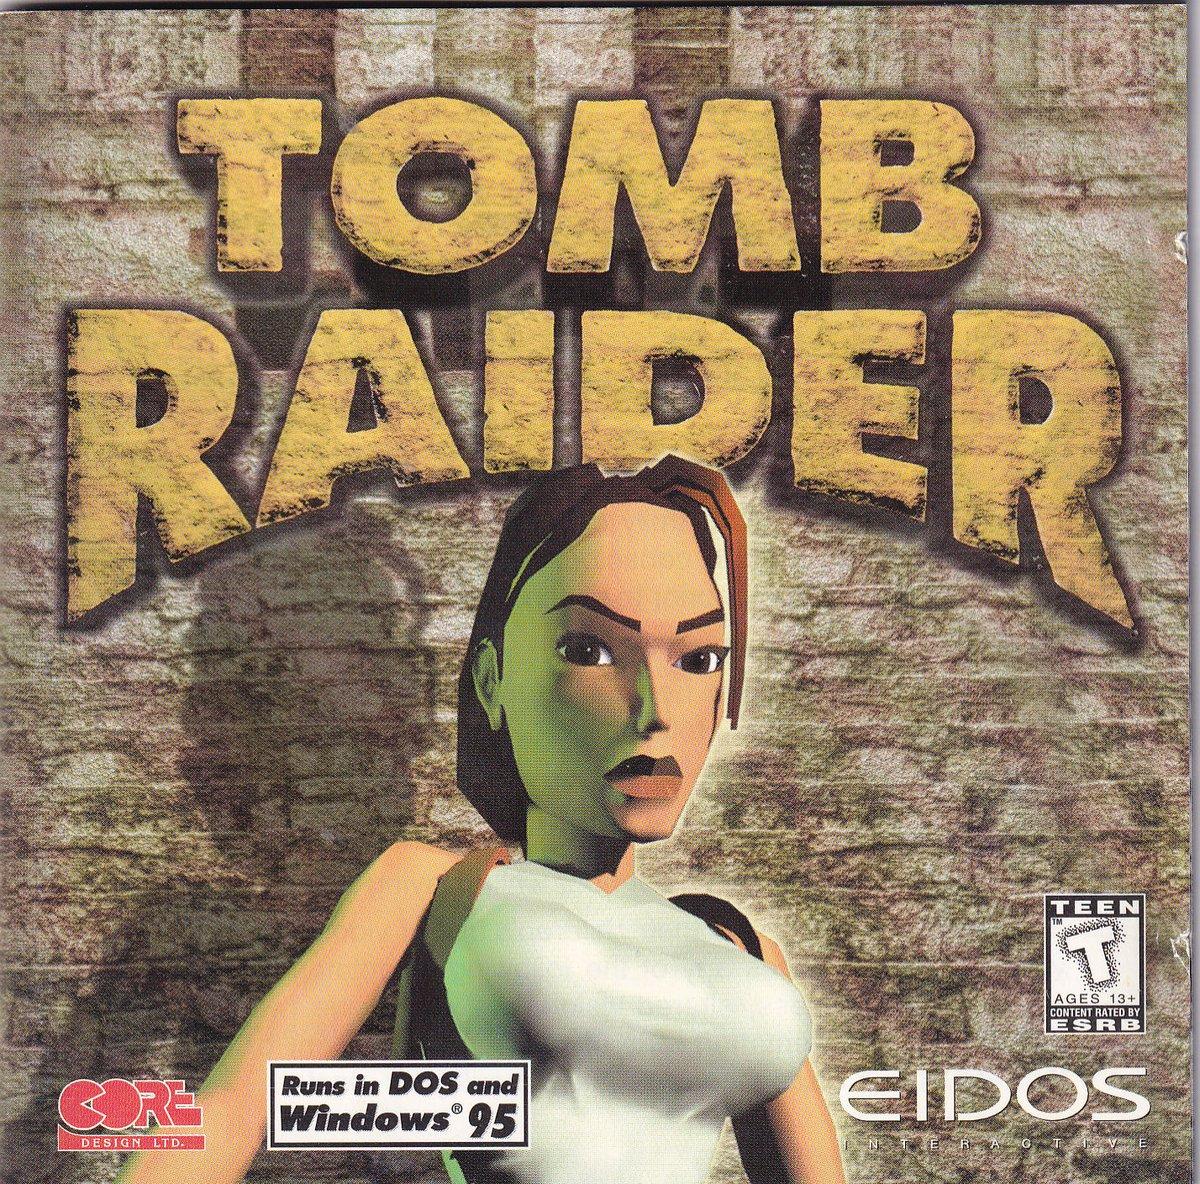 Eidos Tomb Raider (MSDOS)(1996)(Eng)   https://archive.org/details/Eidos_Tomb_Raider_MSDOS_1996_Eng…pic.twitter.com/8sSbrLpajf